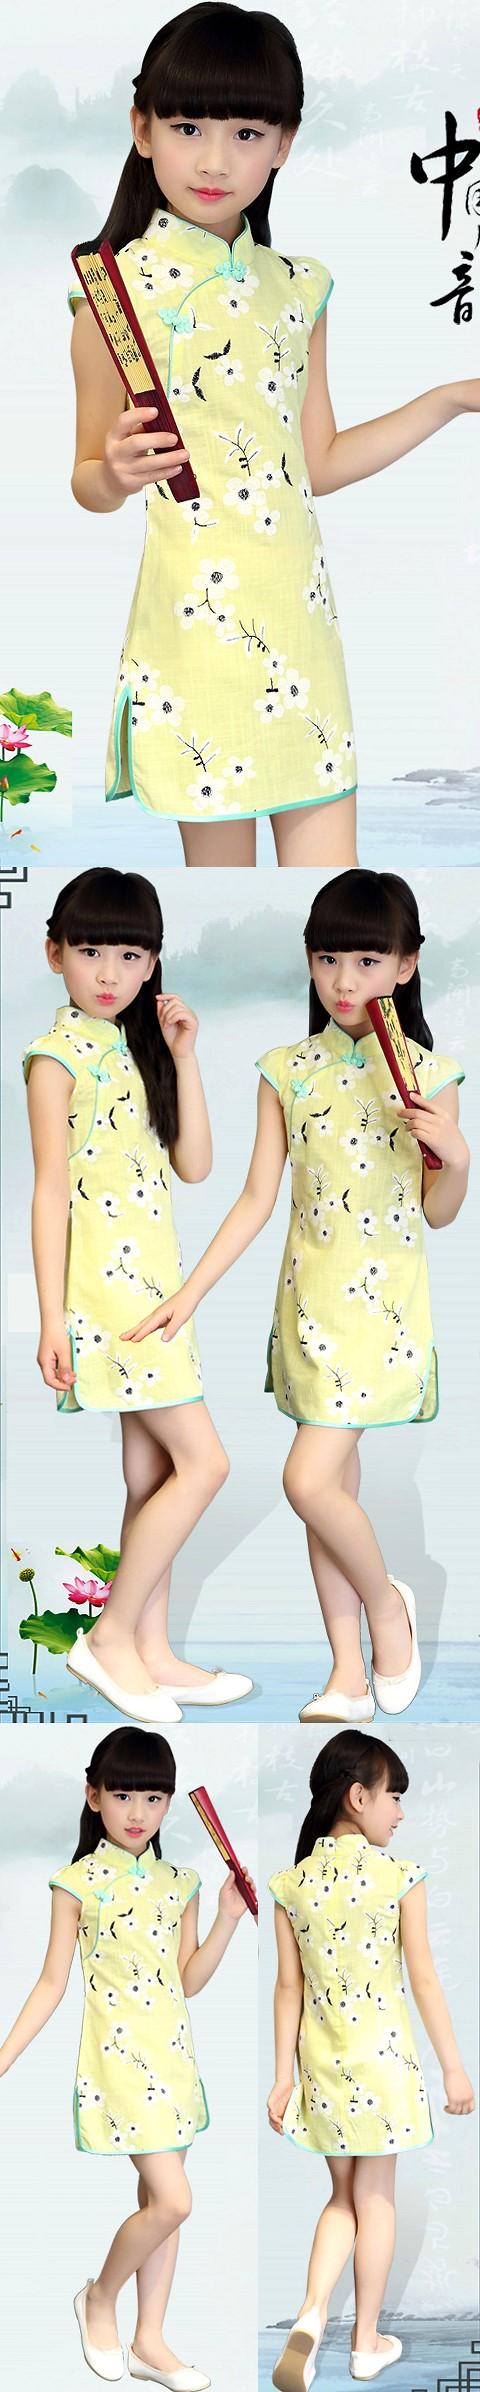 Girl's Floral Cotton Cheongsam Dress (RM)